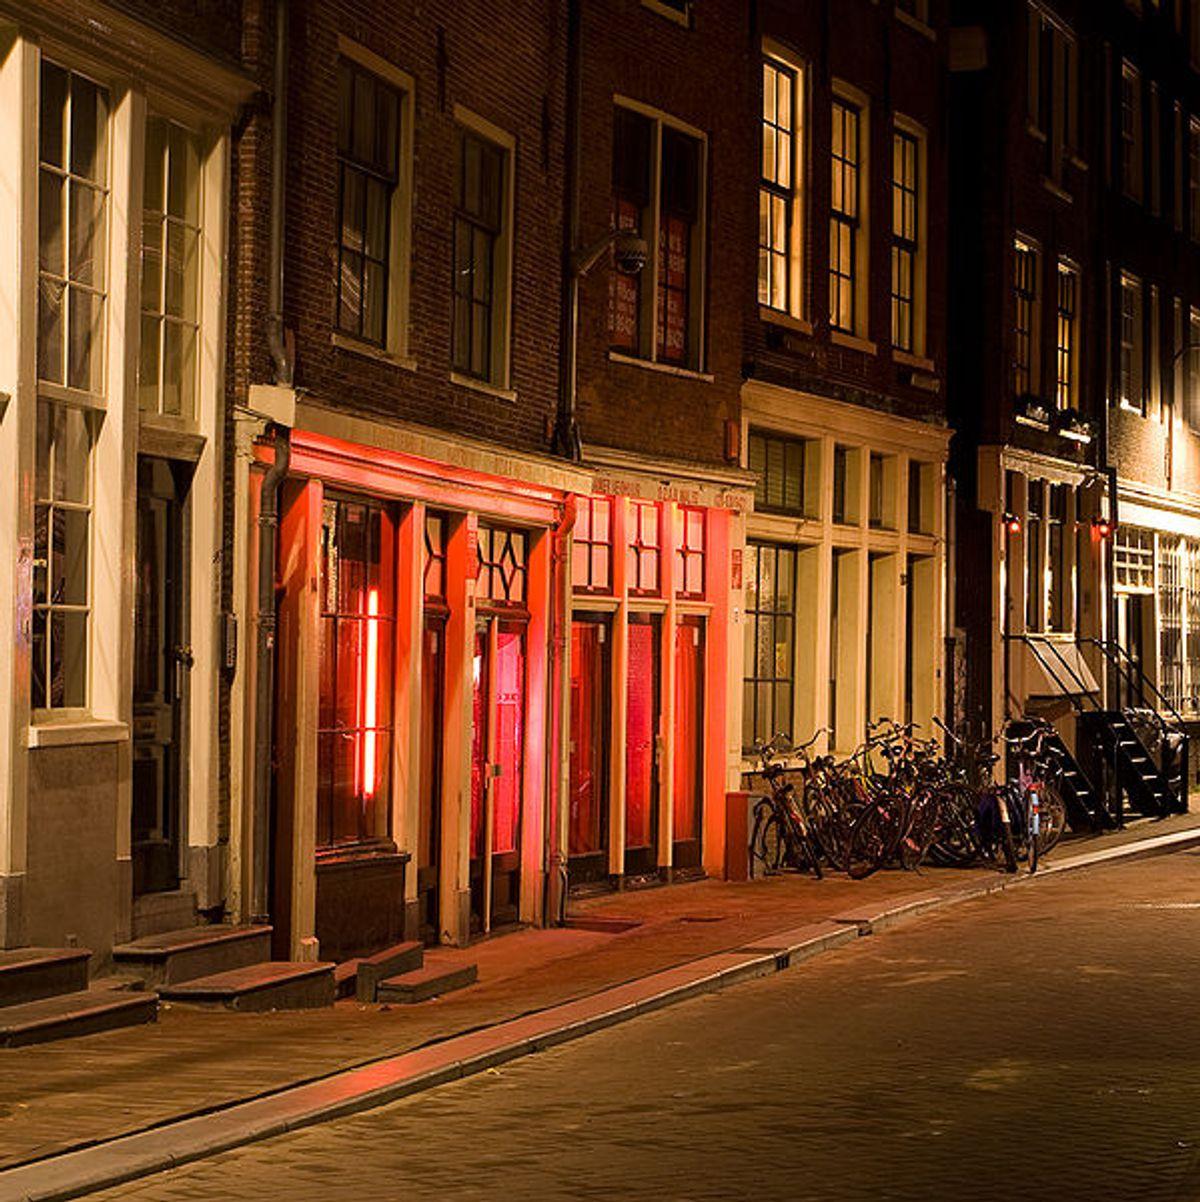 A quiet night in Amersterdam's red light district.